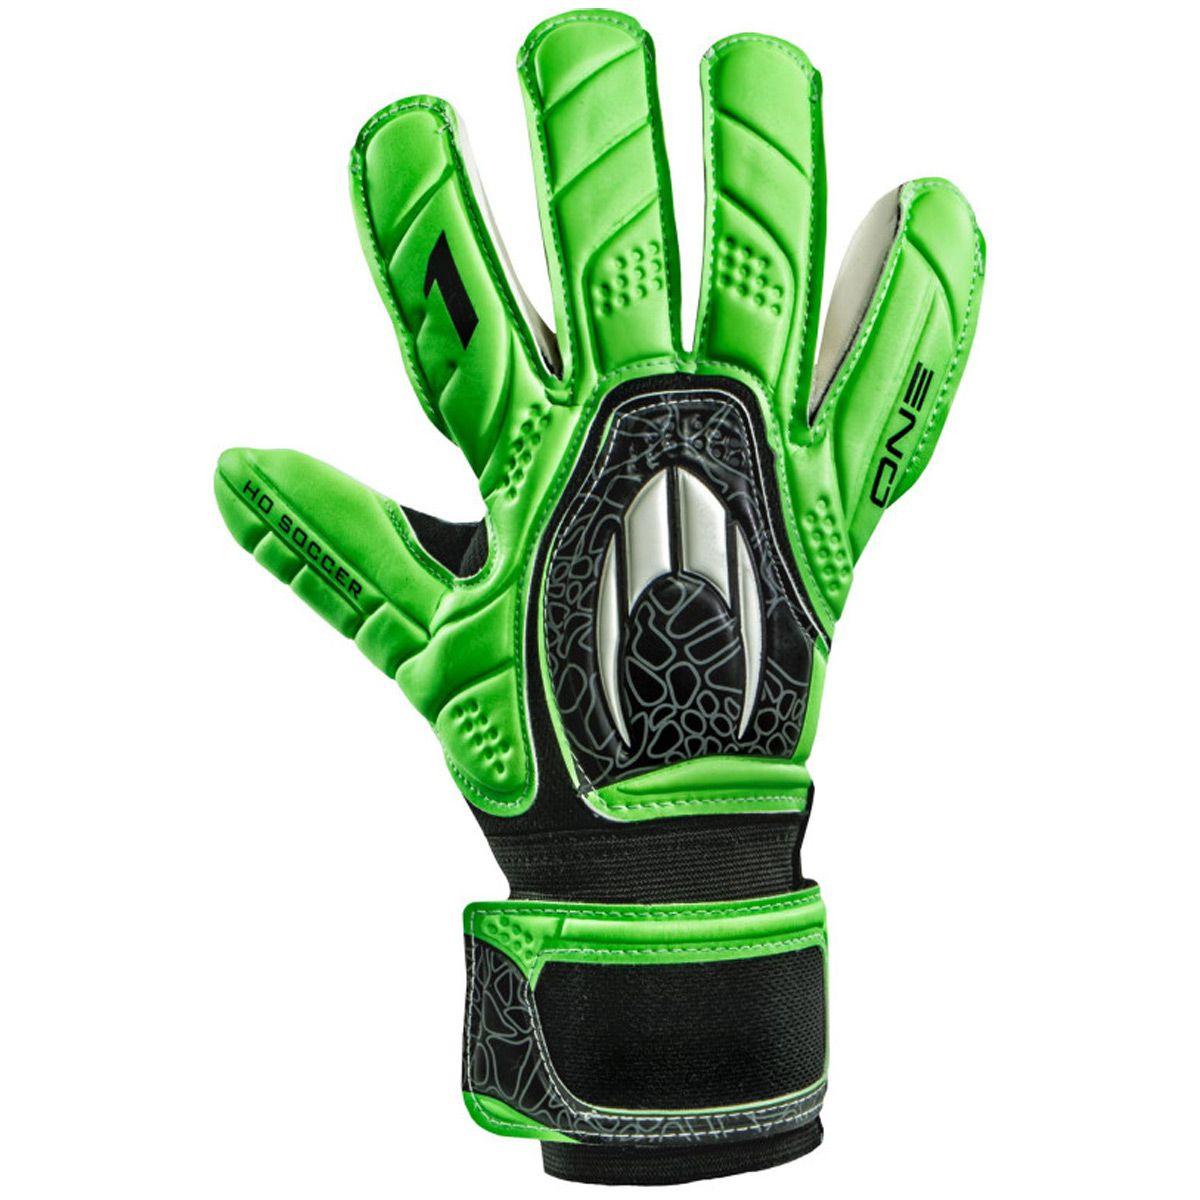 Luva Goleiro HO Soccer One Negative Green Black 9136